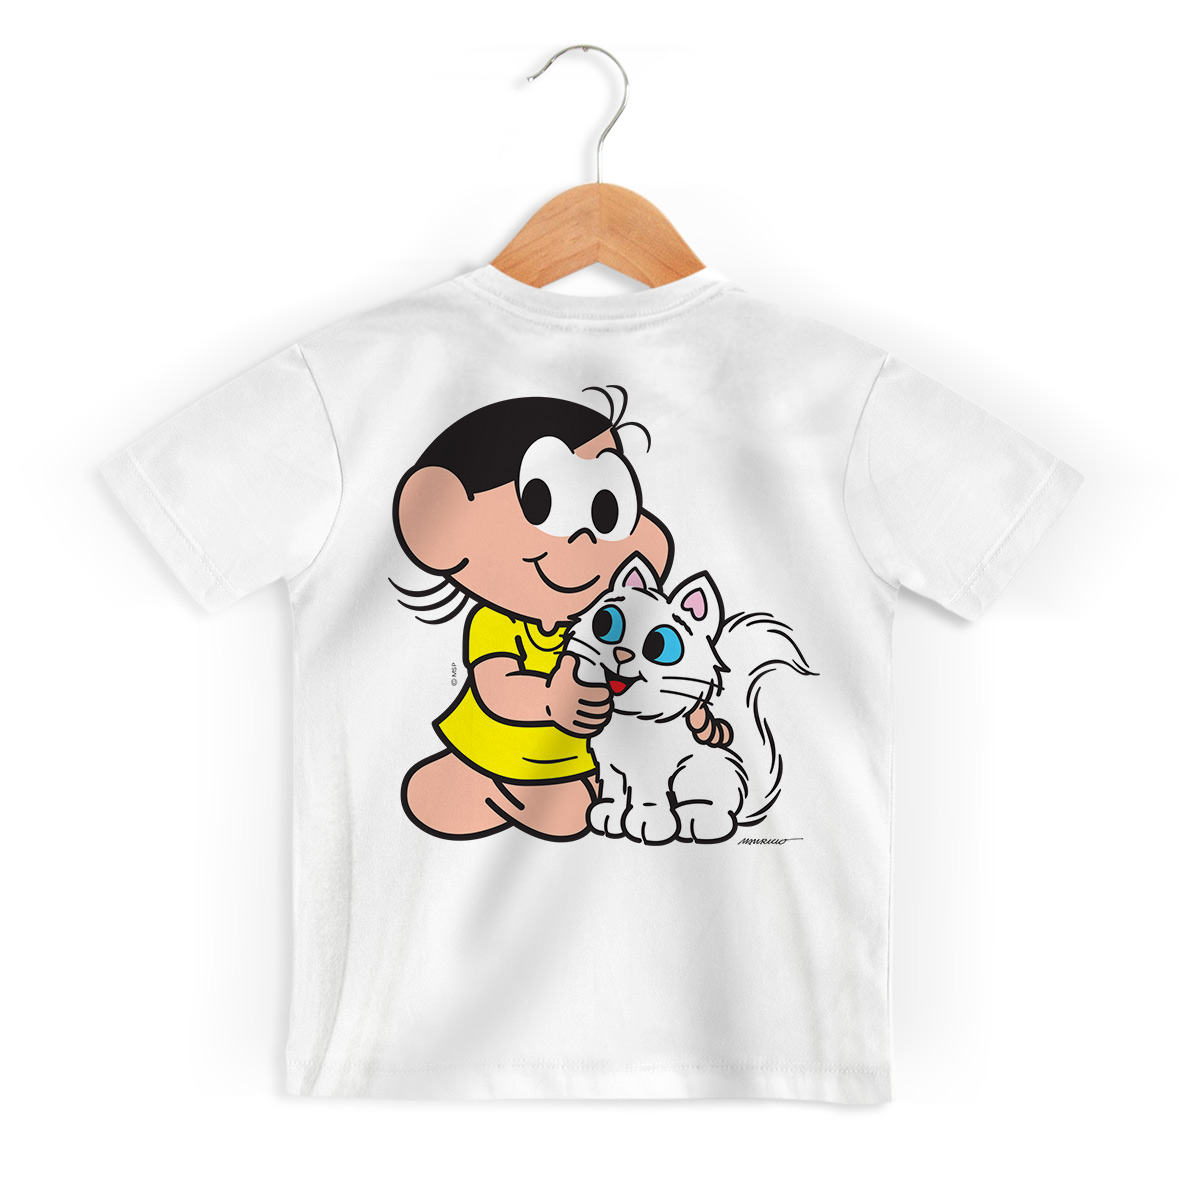 Camiseta Infantil Turma da Mônica Kids Olhões Mingau